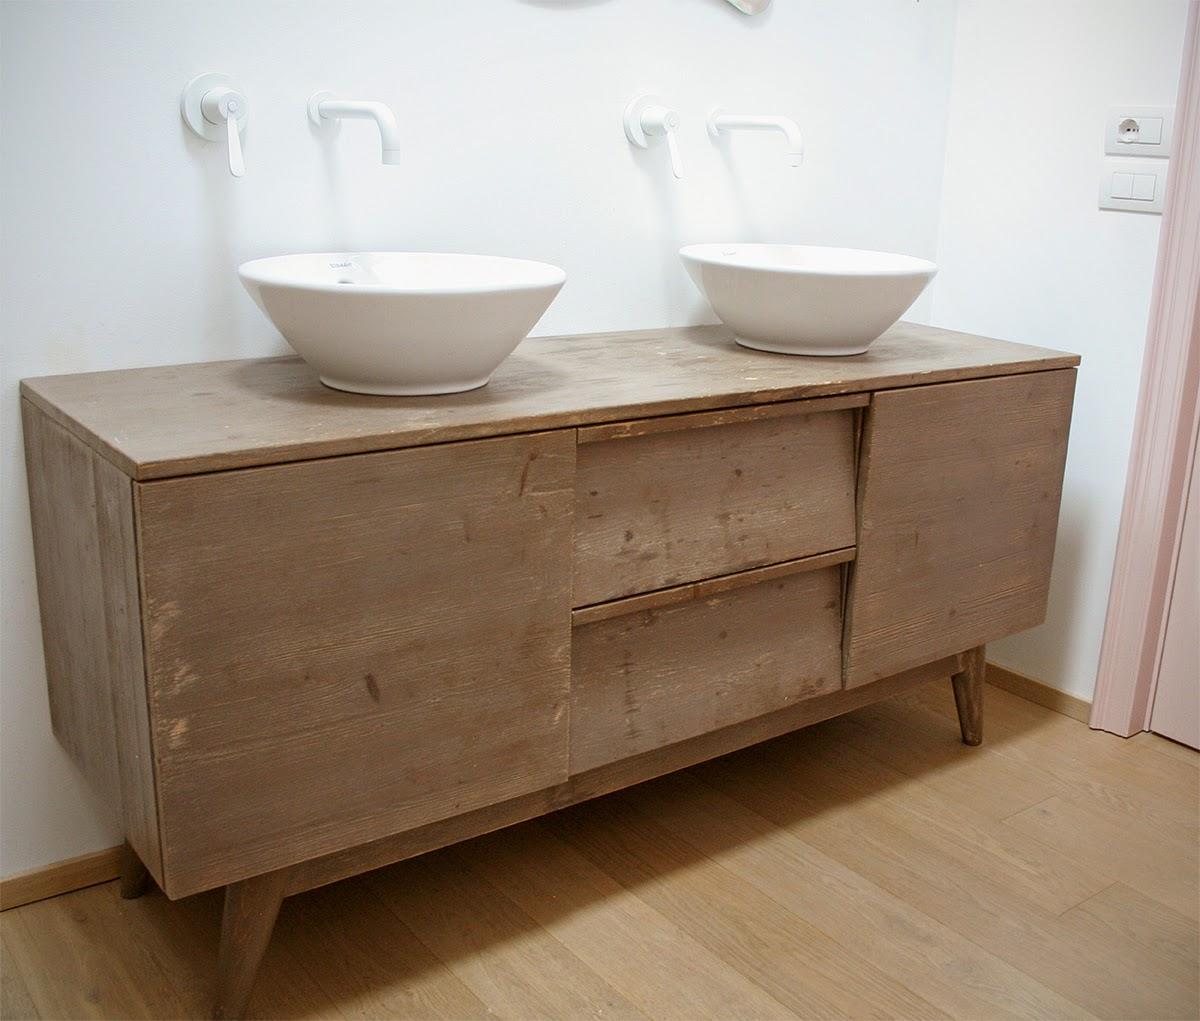 Boiserie e cucine su misura 2014 03 30 - Verniciatura a bagno ...